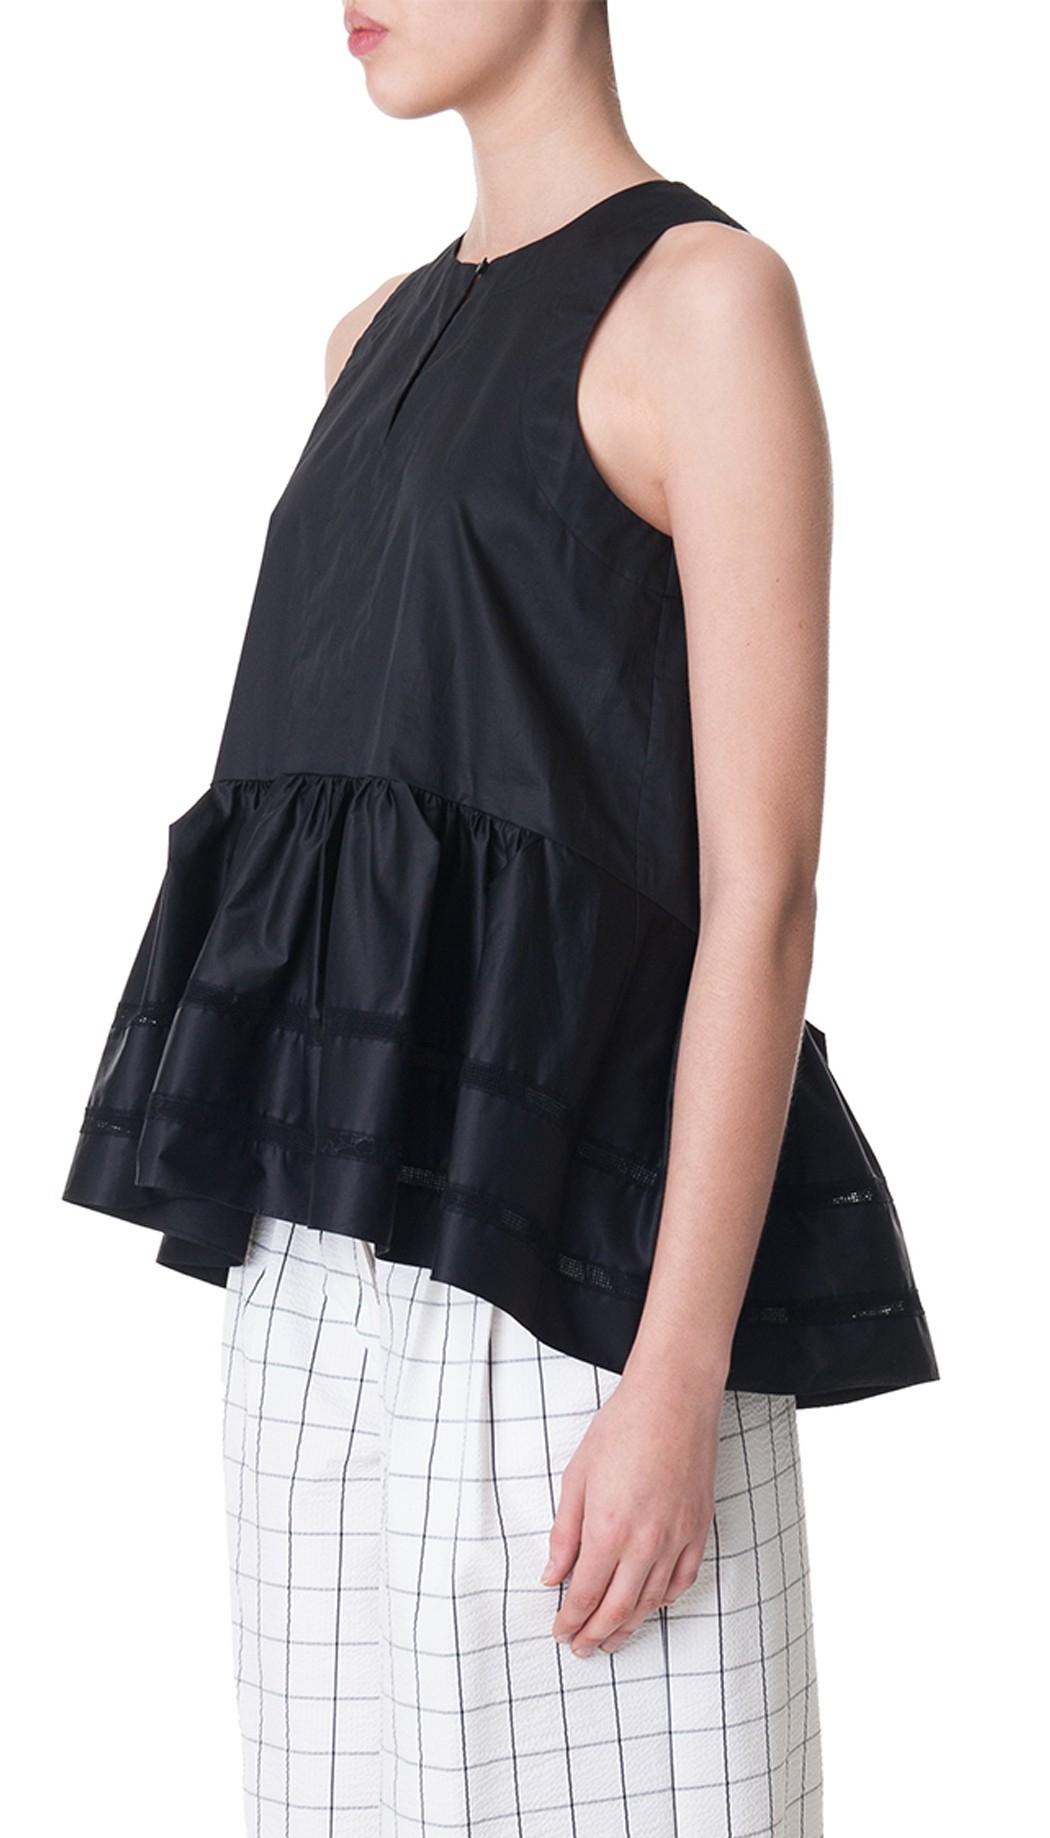 Lyst - Tibi Satin Poplin Origami Sleeveless Top in Black - photo#6